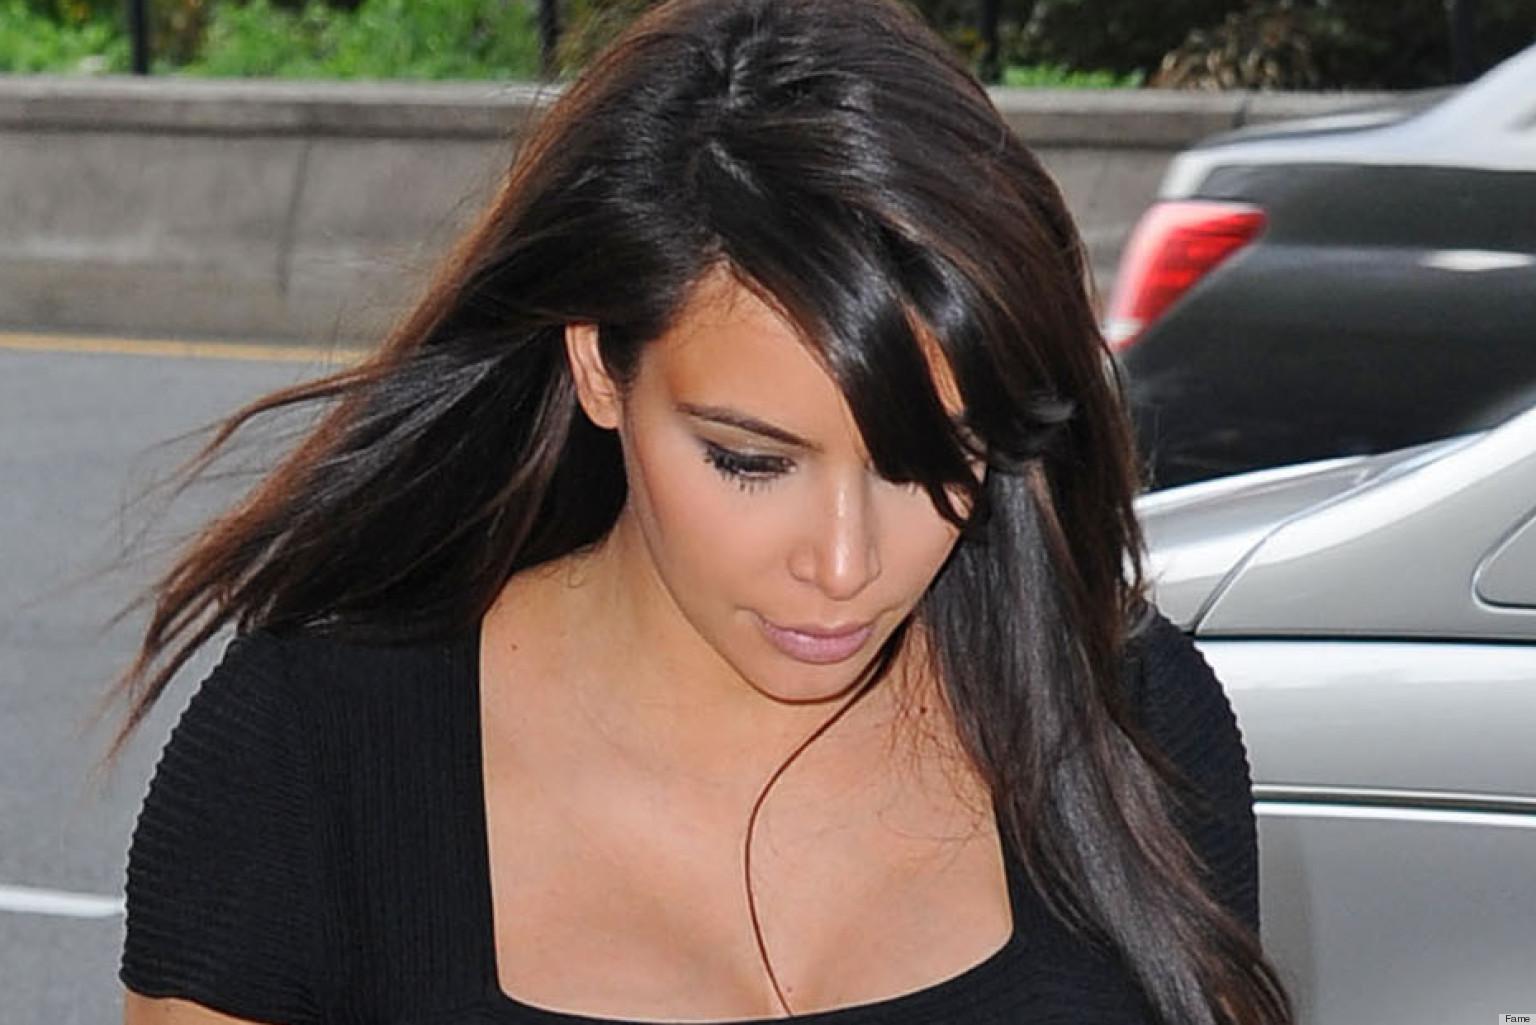 PHOTOS: Kim Kardashian Could Really Use A Slip